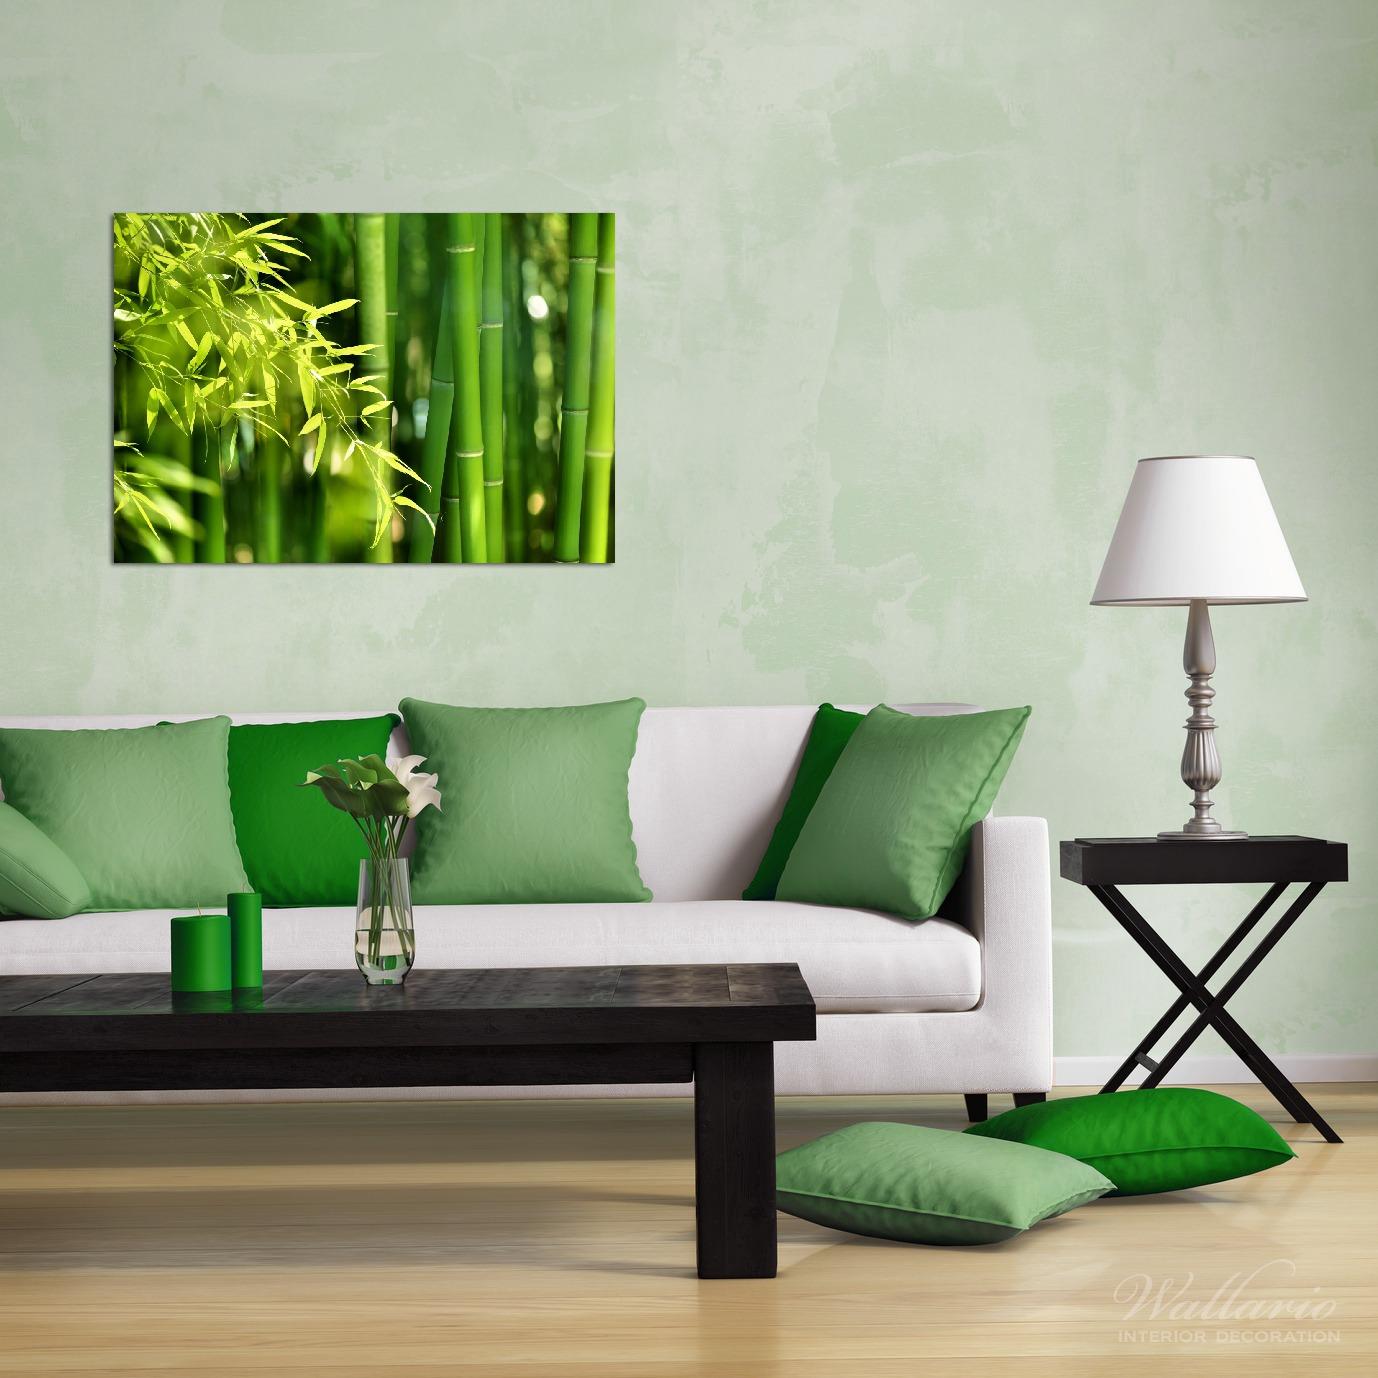 Wandbild Bambuswald mit grünen Bambuspflanzen – Bild 2